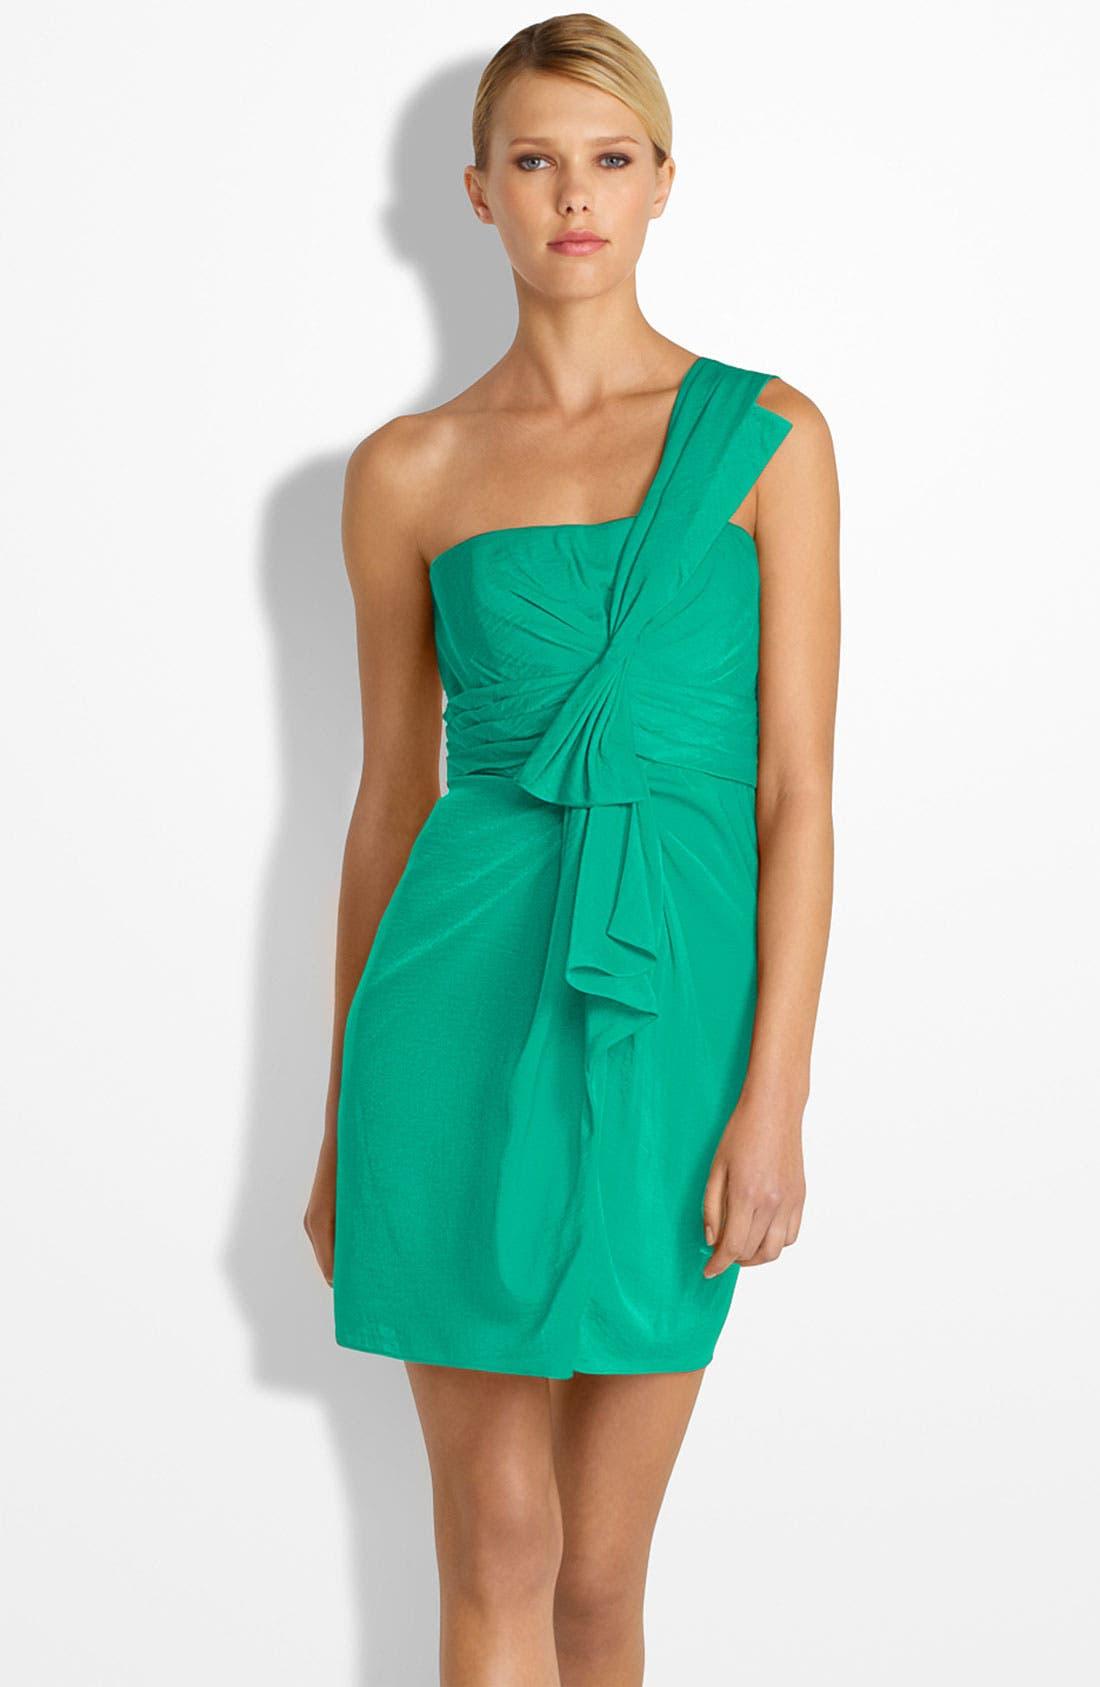 Alternate Image 1 Selected - BCBGMAXAZRIA Drape Front One-Shoulder Satin Dress (Petite)